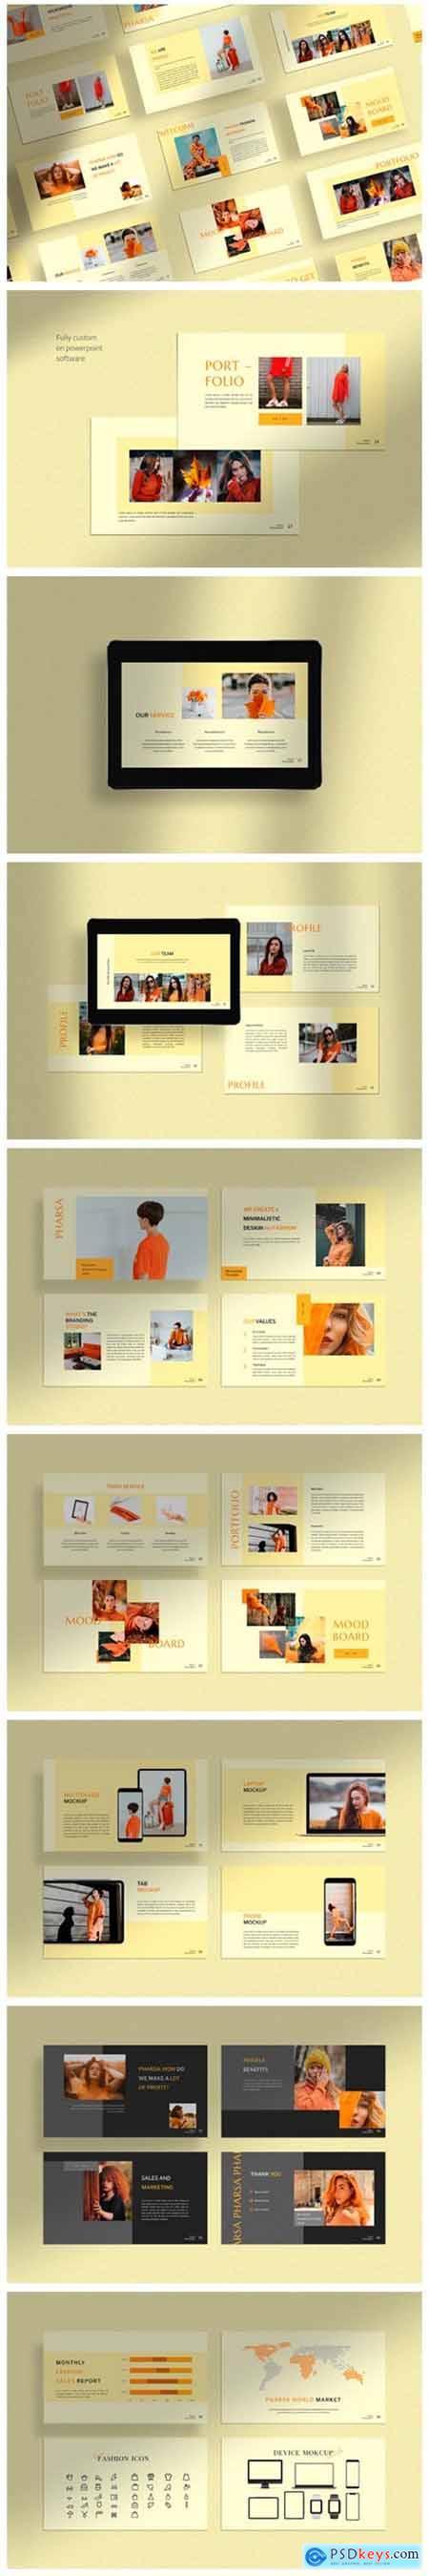 Pharsa - Minimalist Fashion Template 3038107